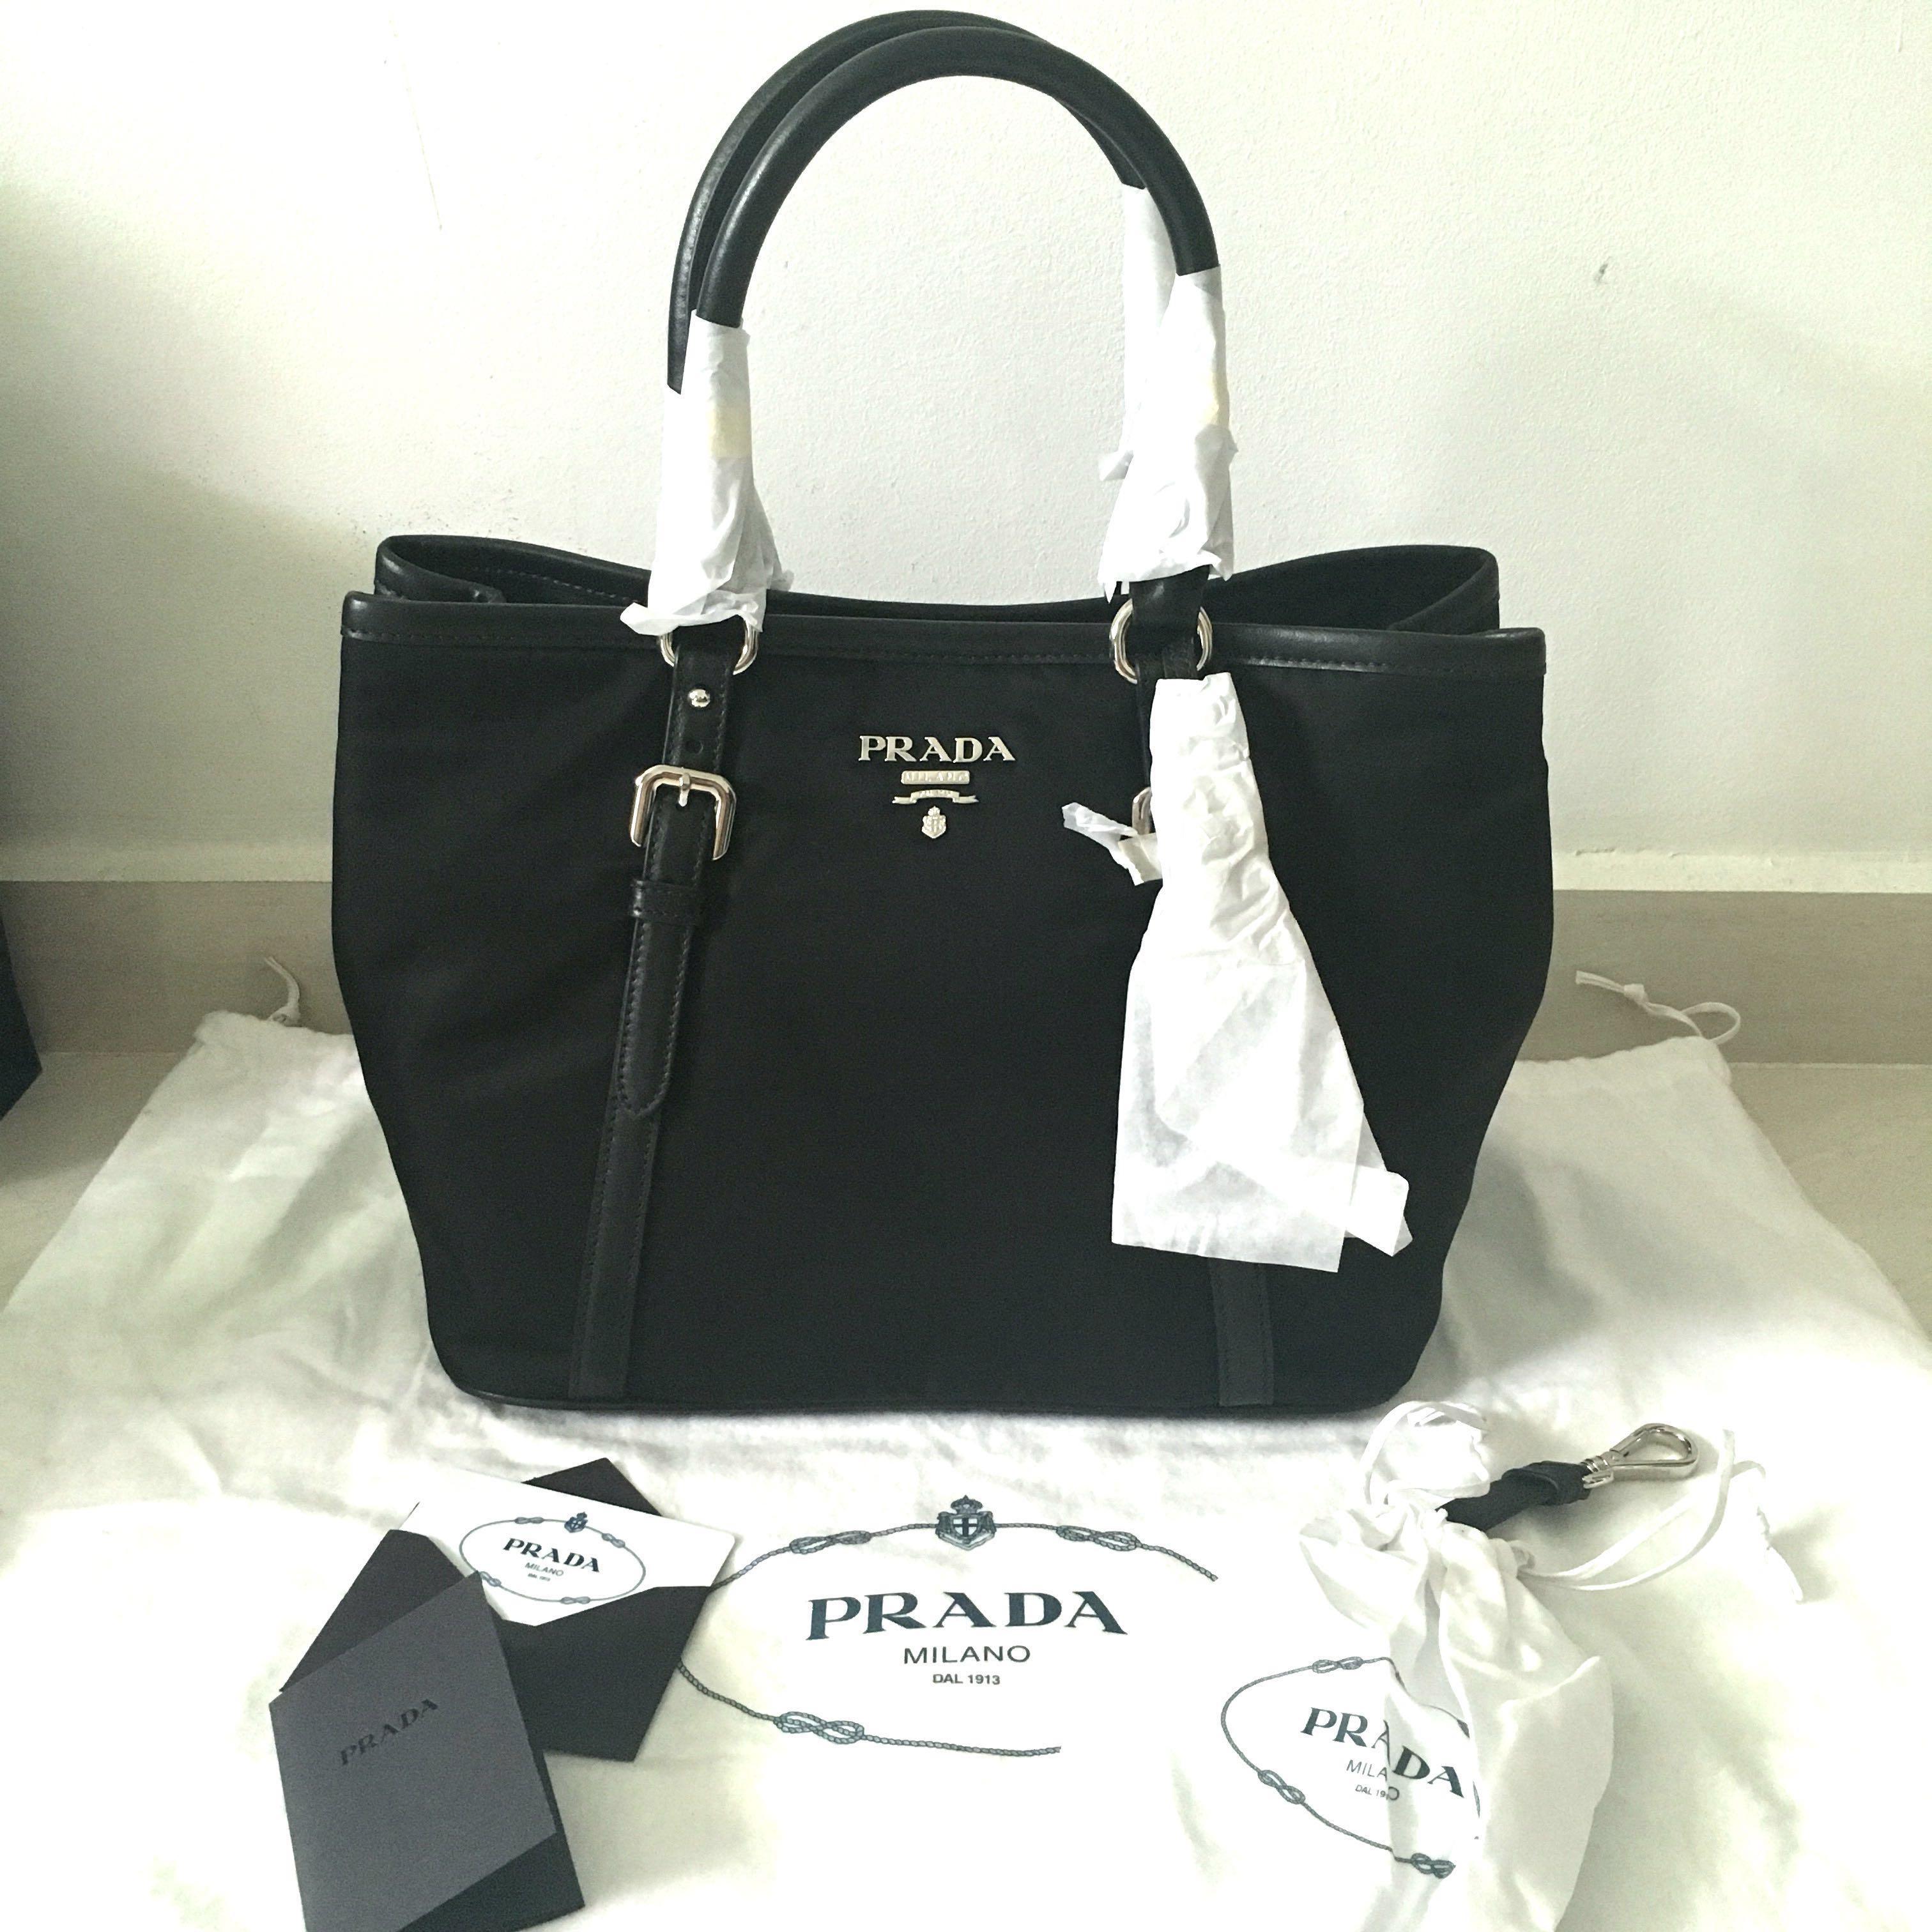 ba31cd38d6f2 BRAND NEW - Prada Bauletto Aperto Convertible Bag BN1841